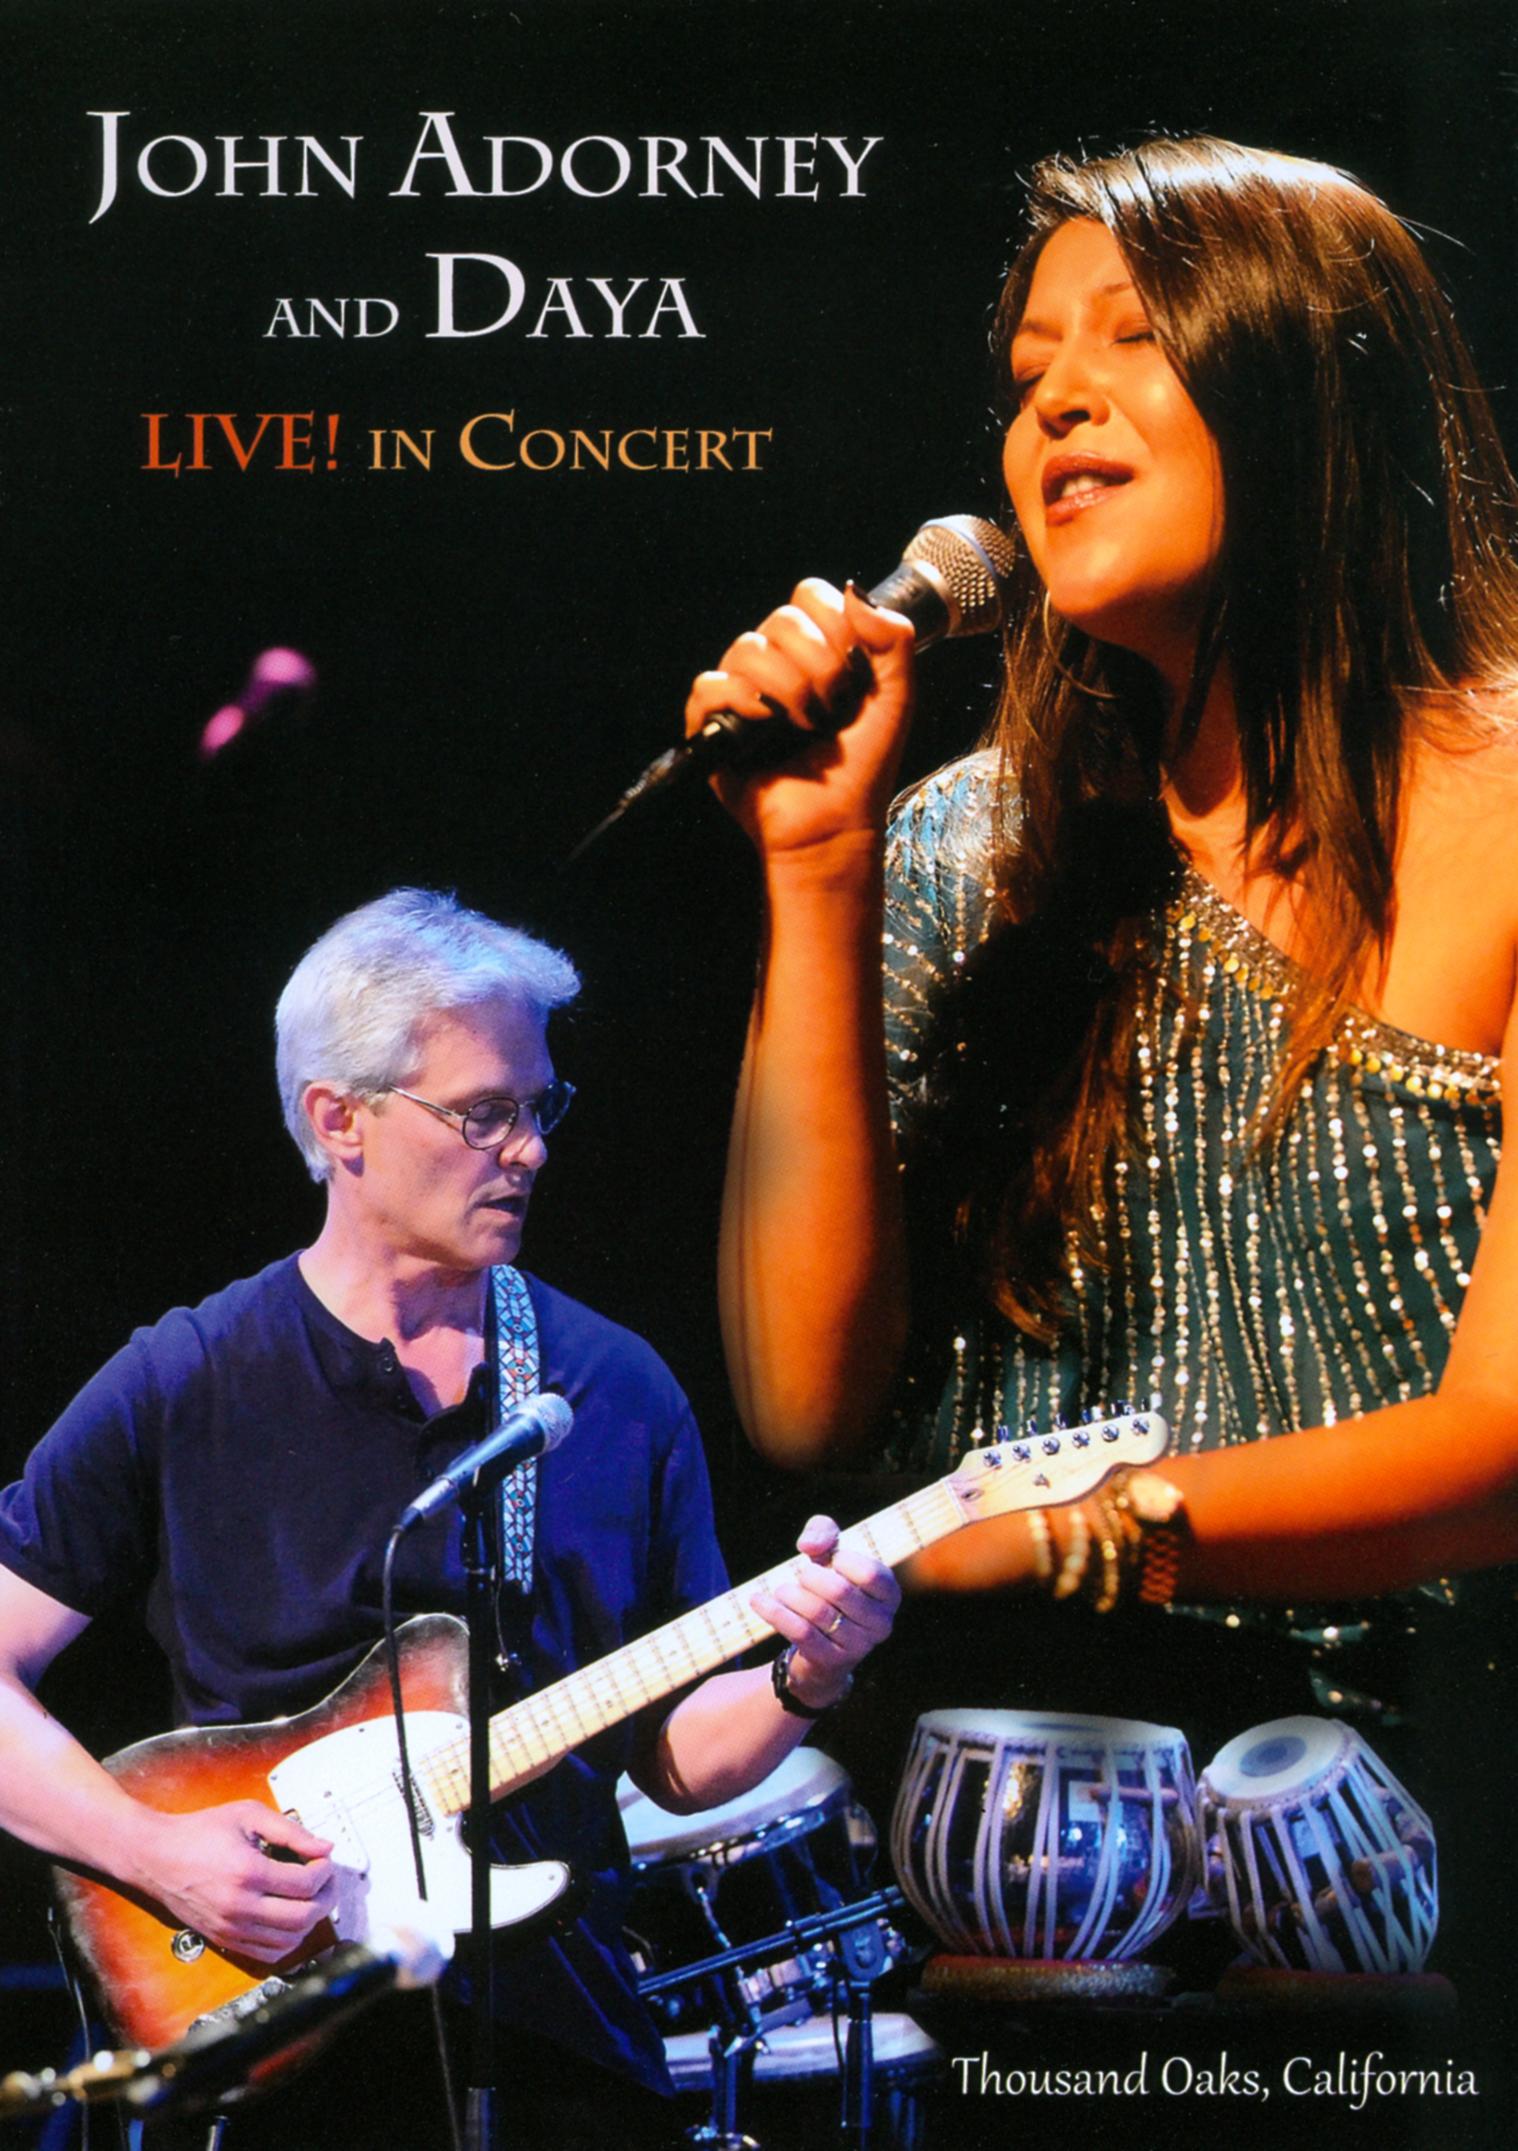 John Adorney and Daya: Live! In Concert